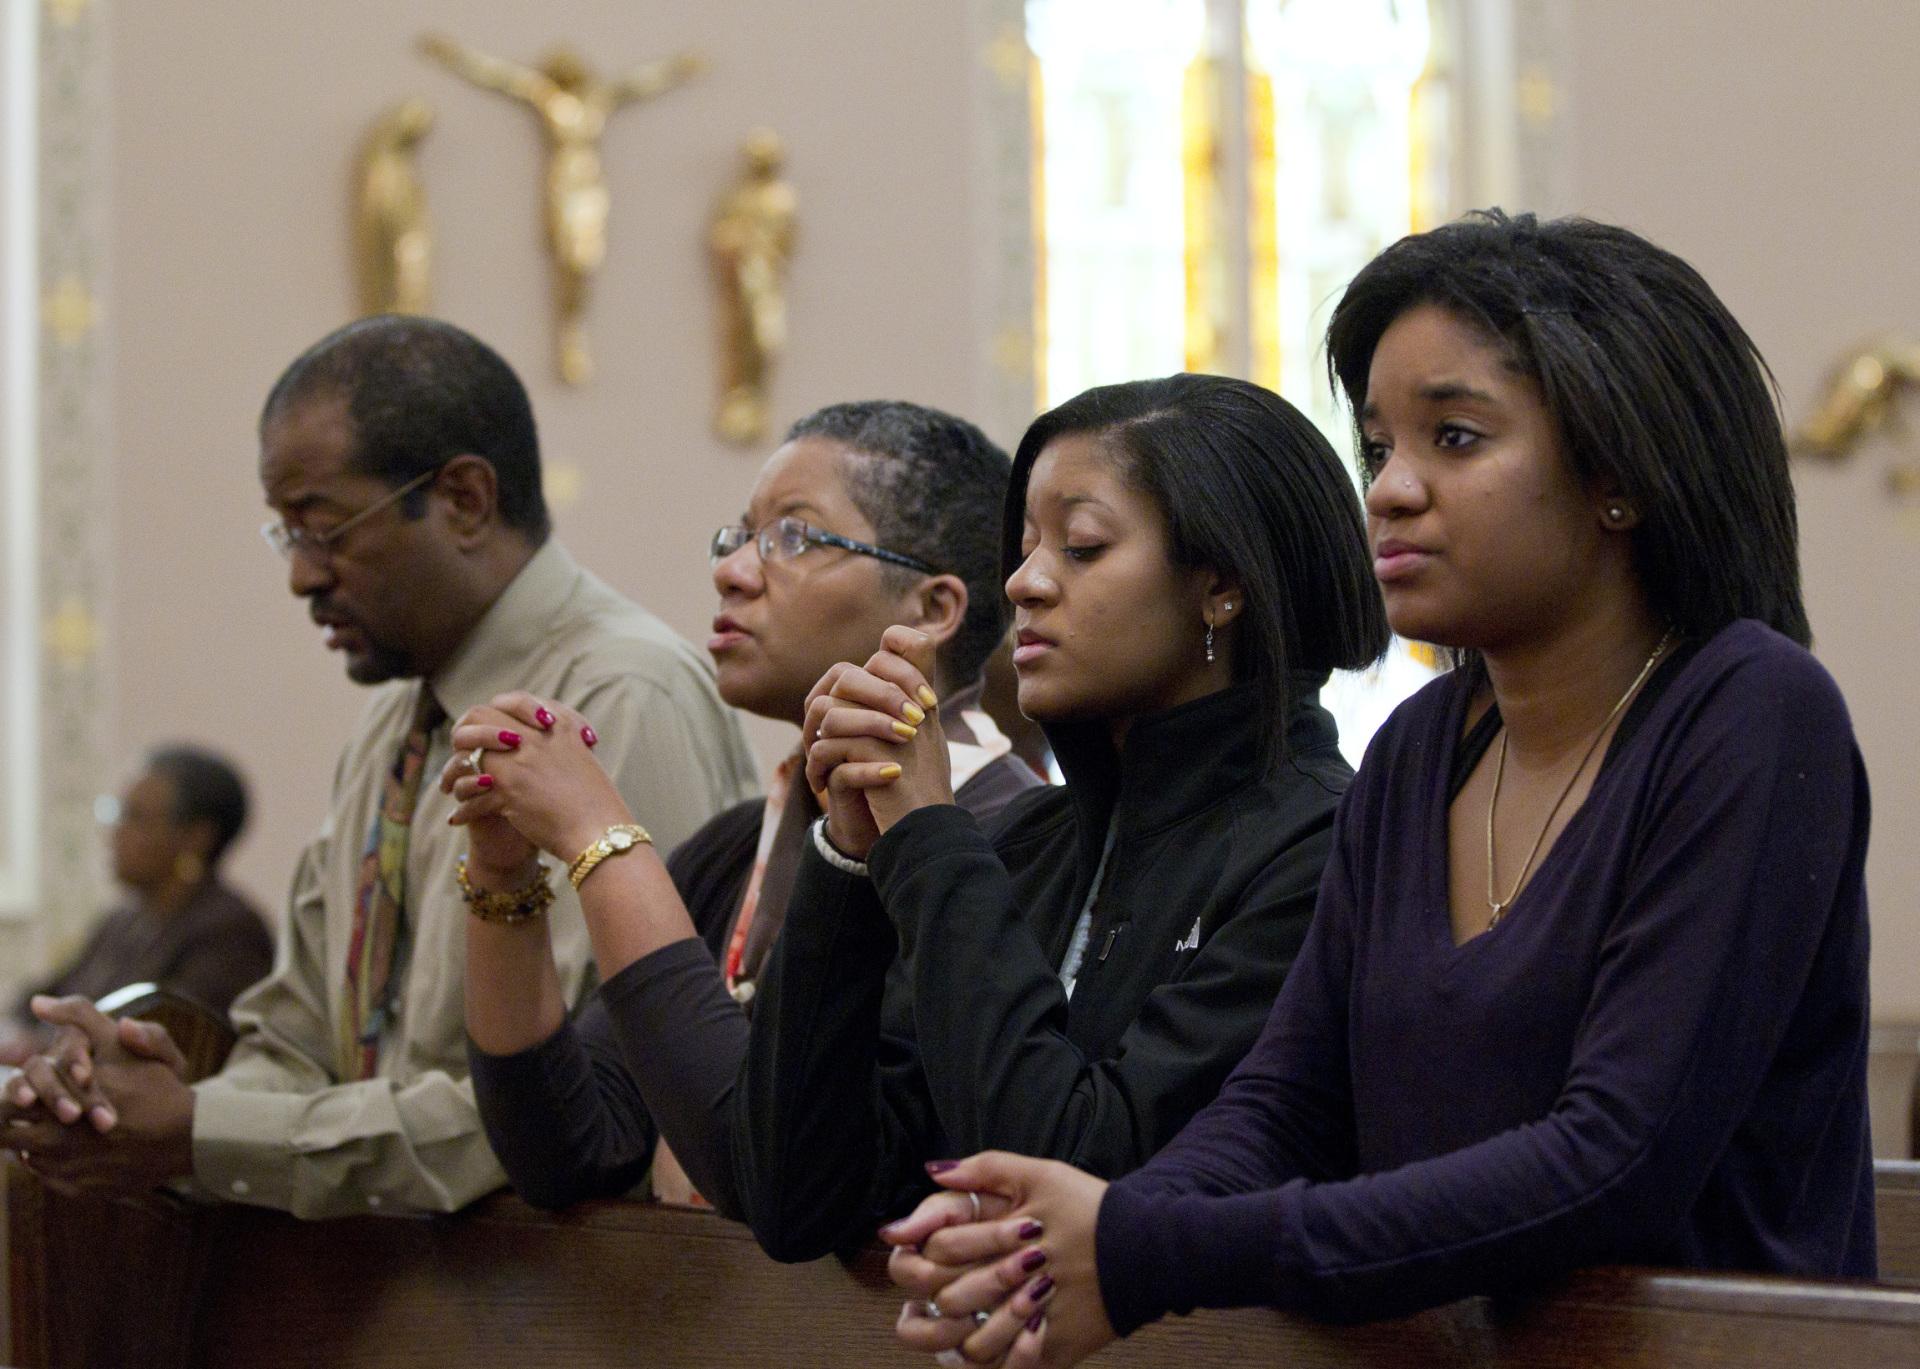 Why Millennials Should Go to Church (BET.com)